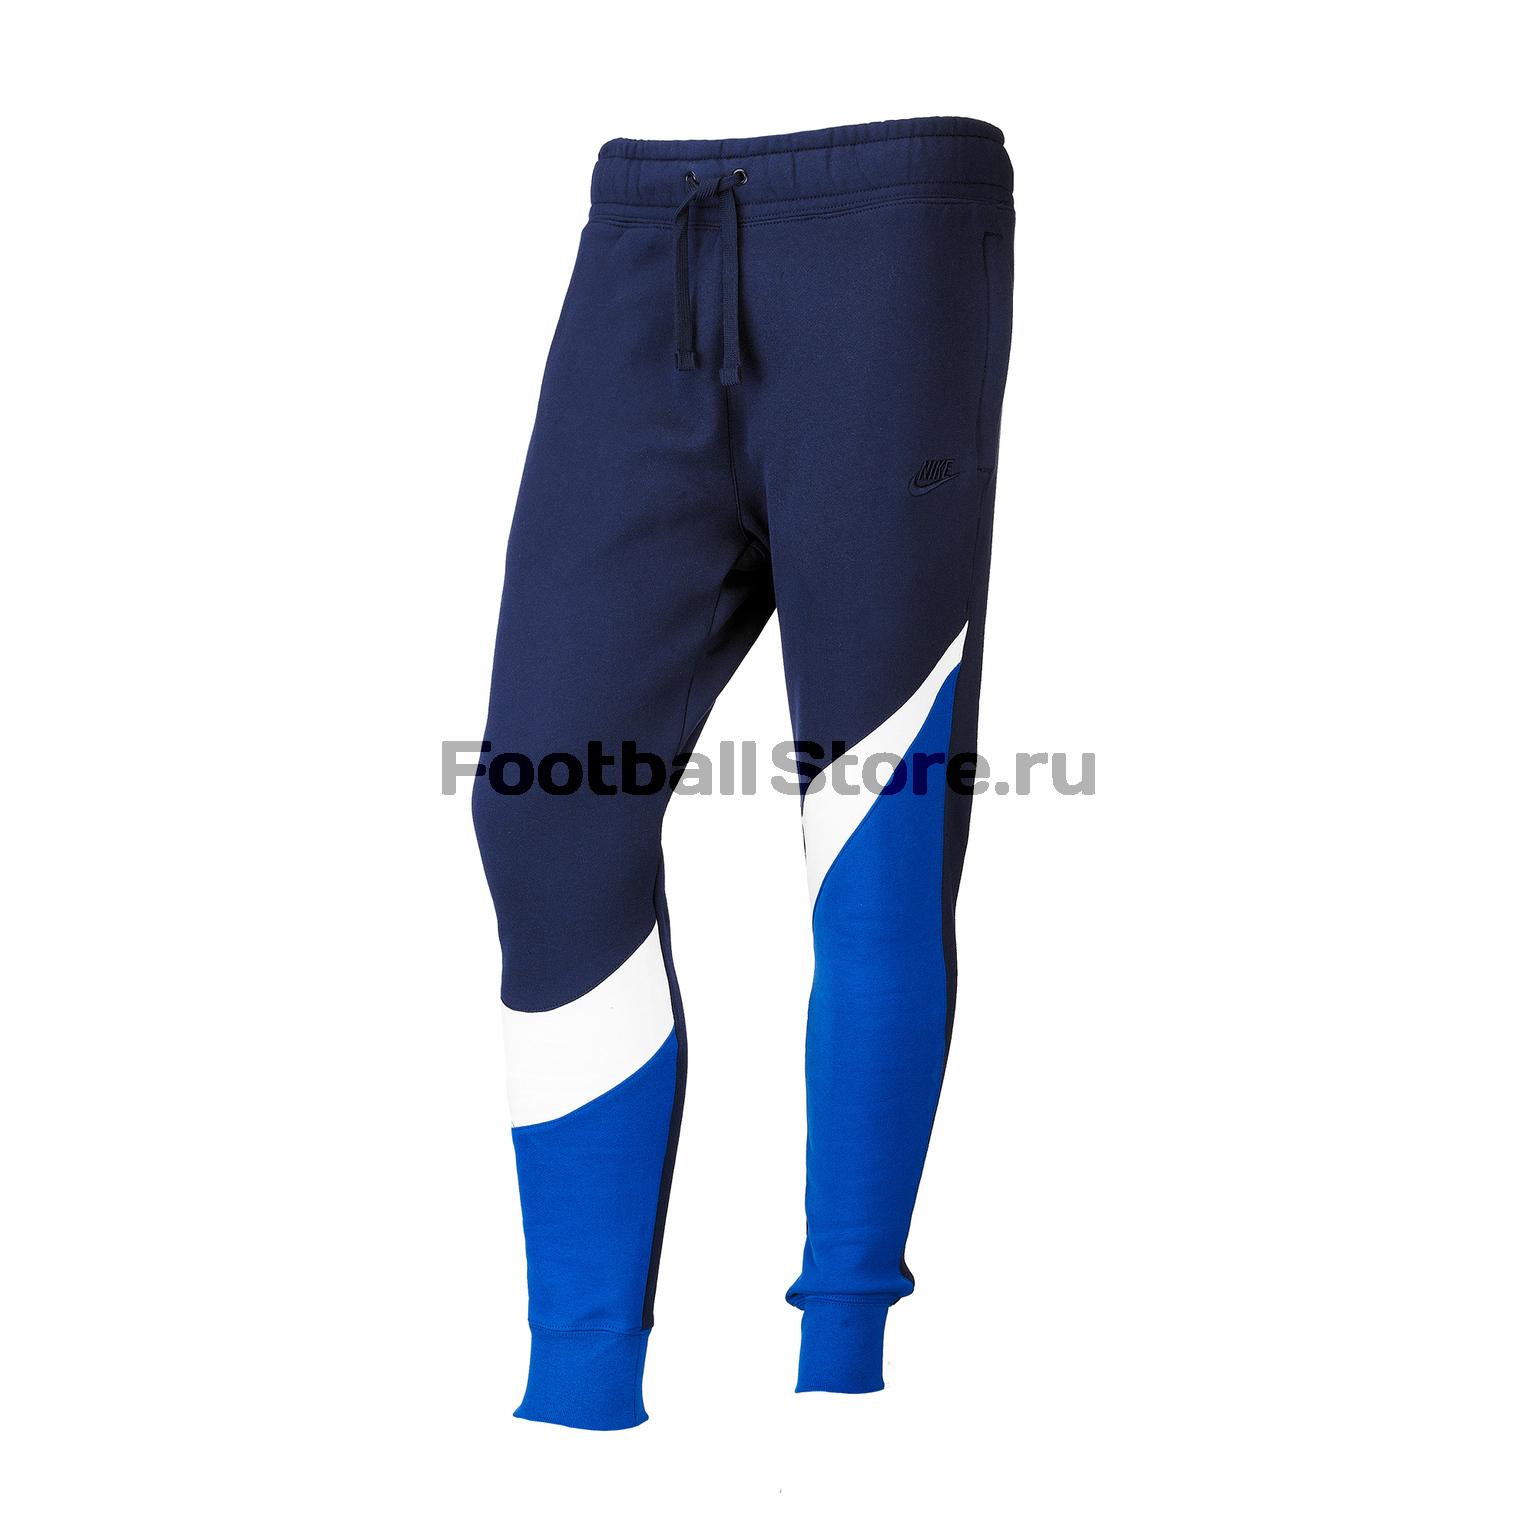 Брюки Nike Pant BB BQ6467-451 брюки nike pant bb bq6467 451